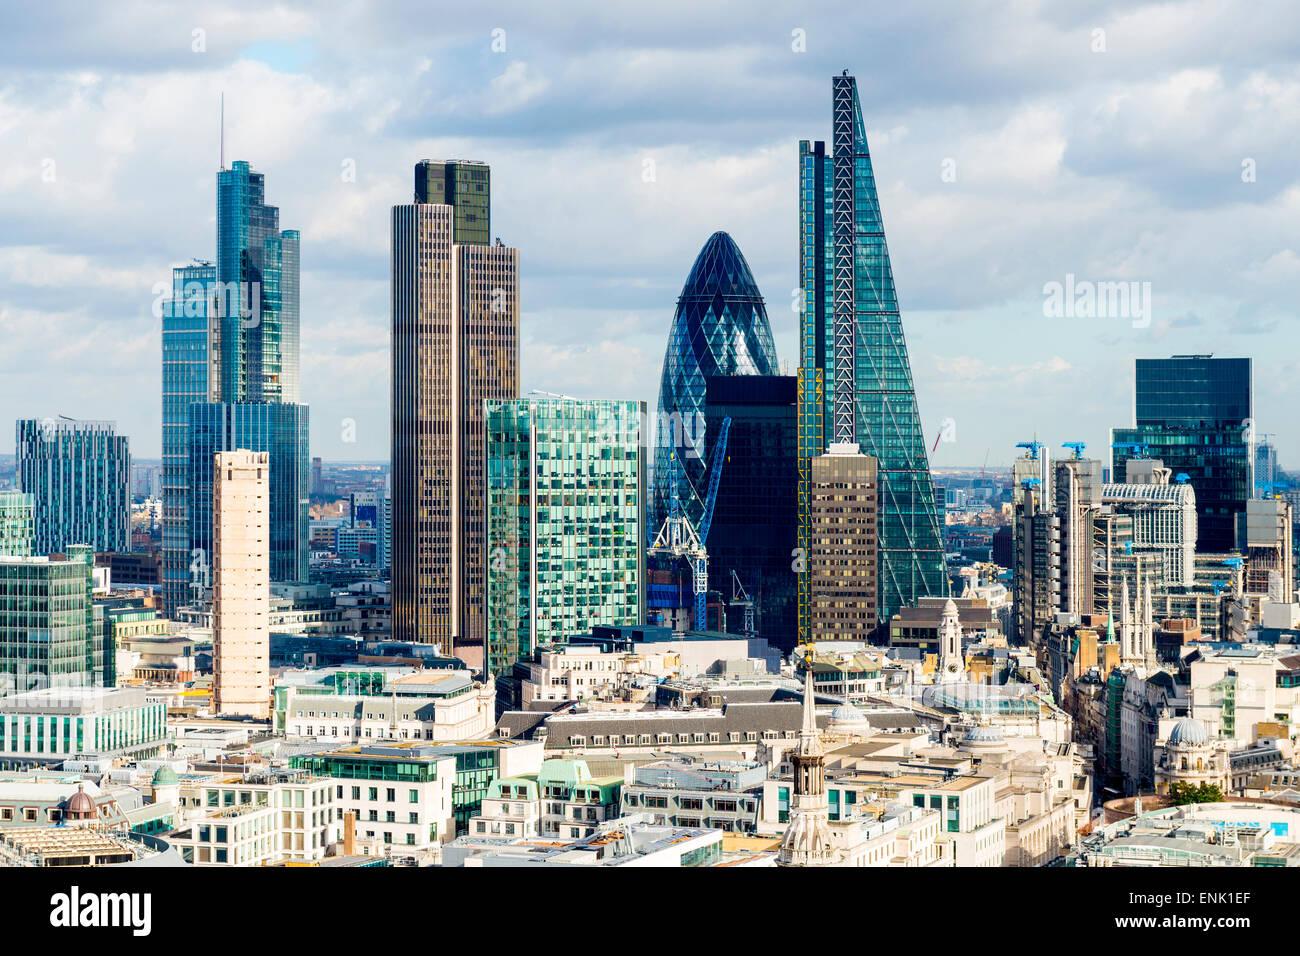 Der Londoner Skyline, London, England, Vereinigtes Königreich, Europa Stockbild